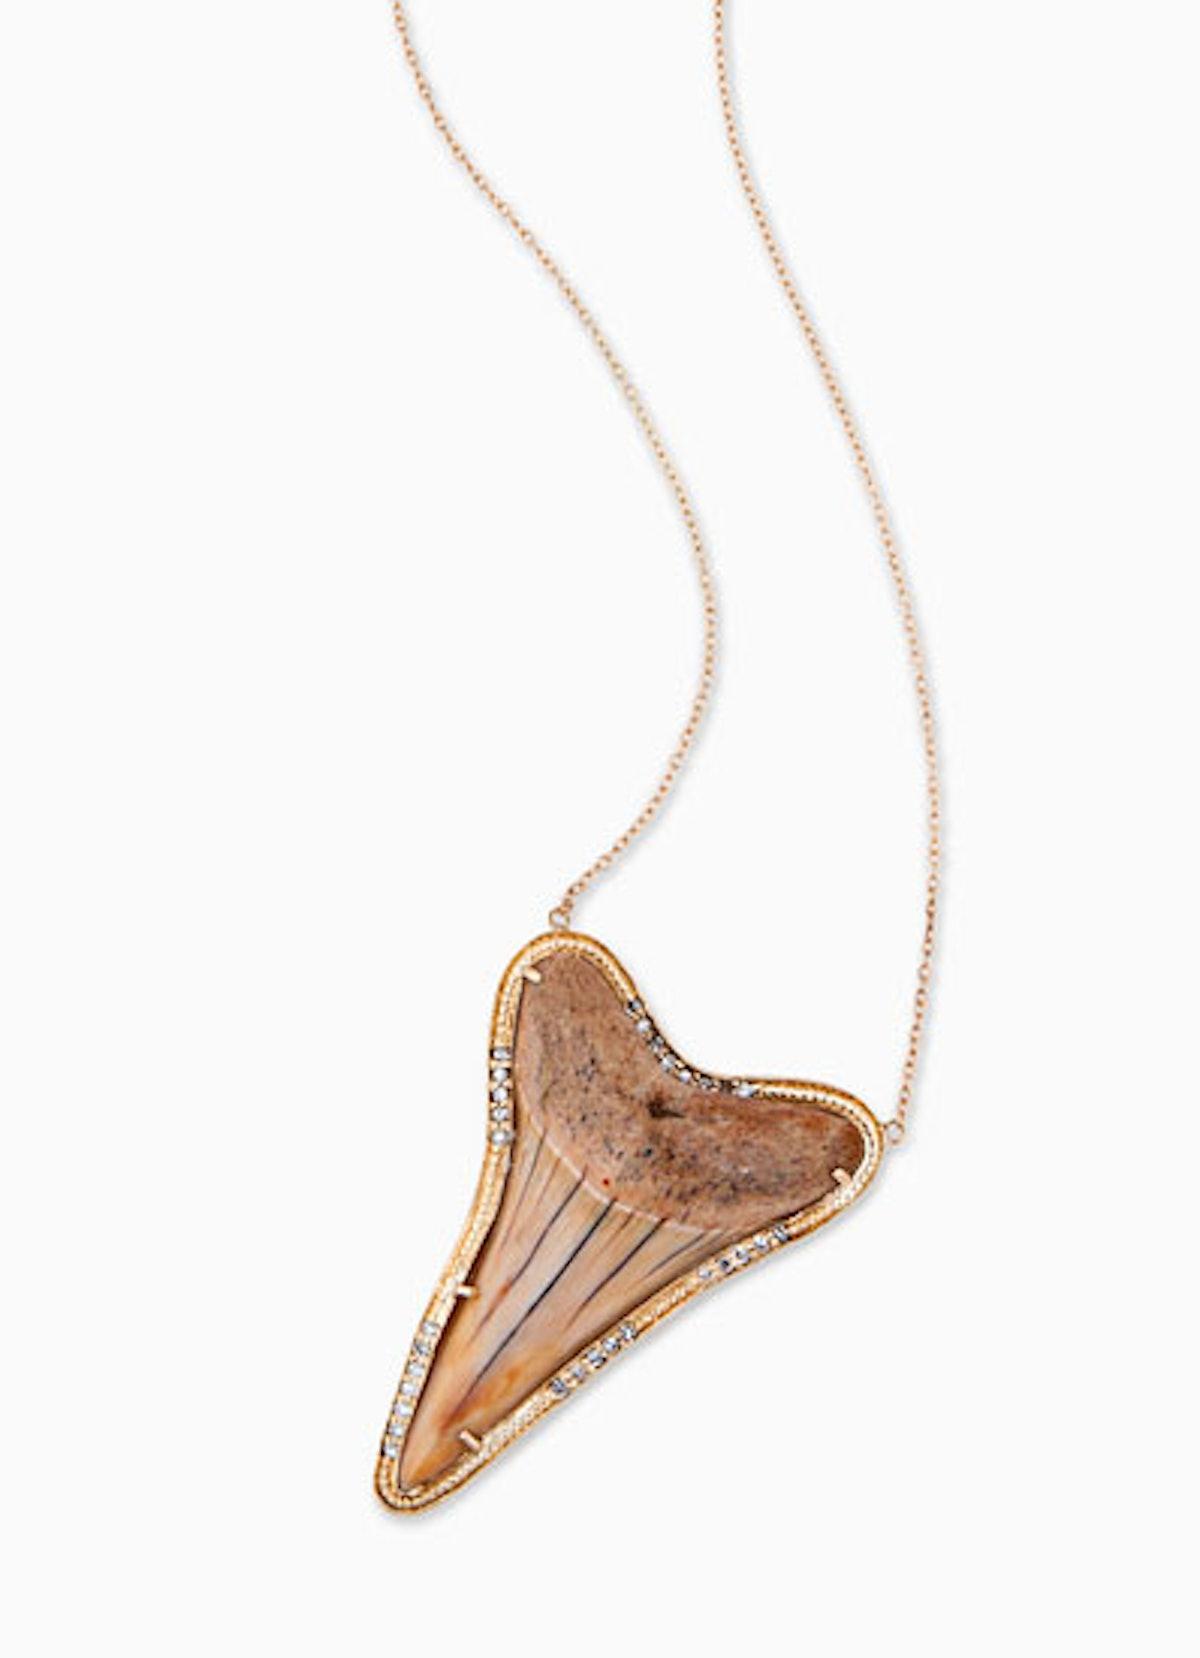 acss-shark-jewelry-08-v.jpg